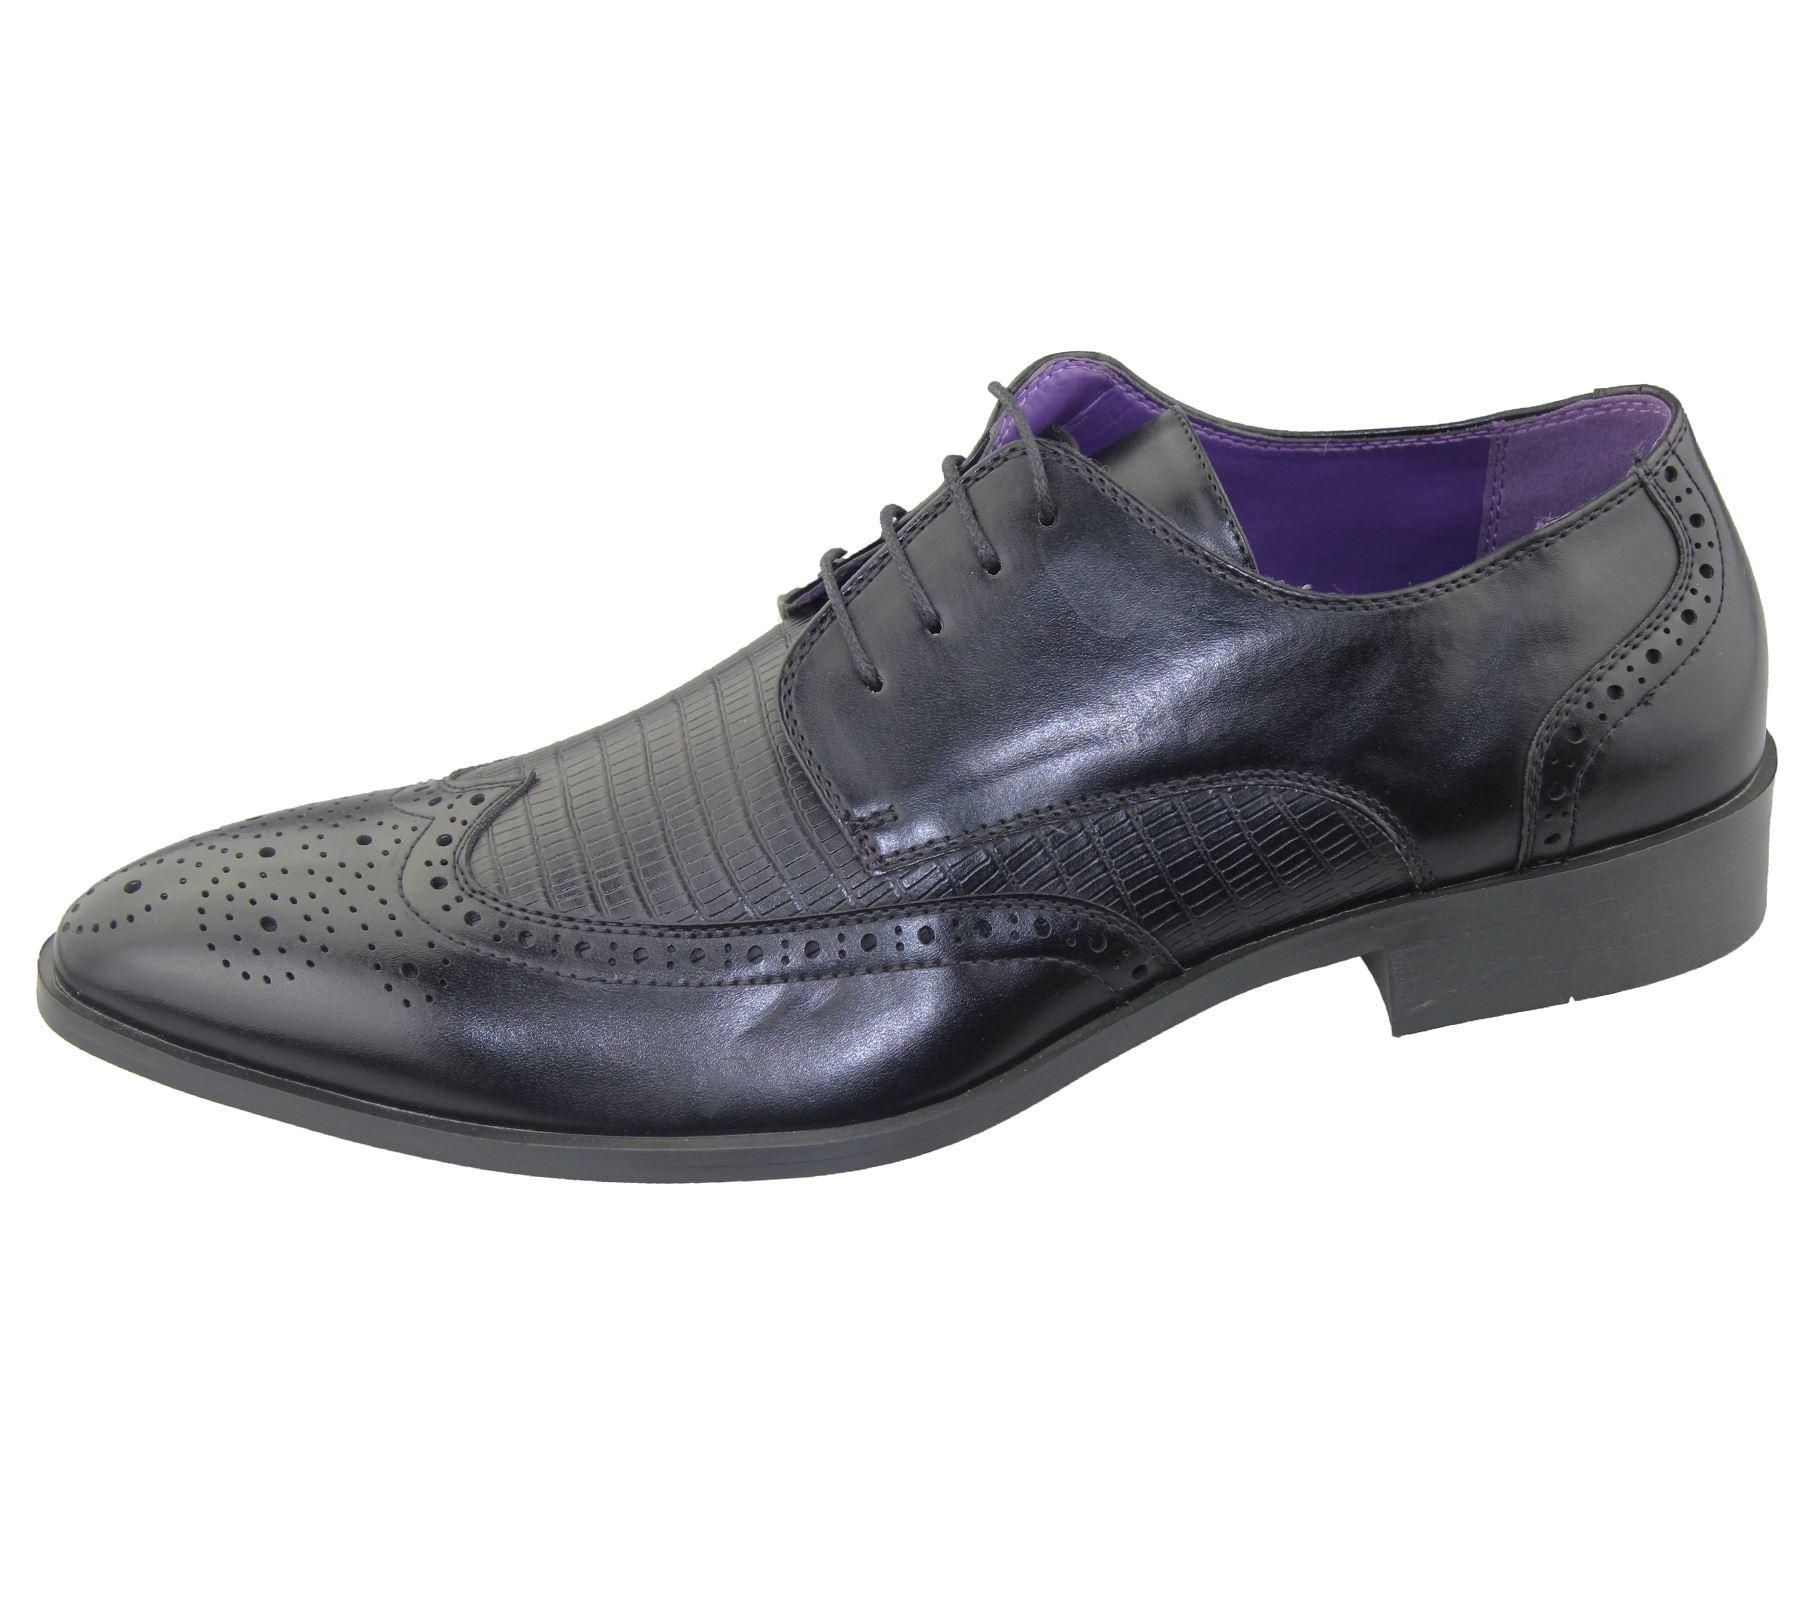 Herren Quasten Halbschuhe Büro Hochzeit Formell Mokassins Schuhe | eBay